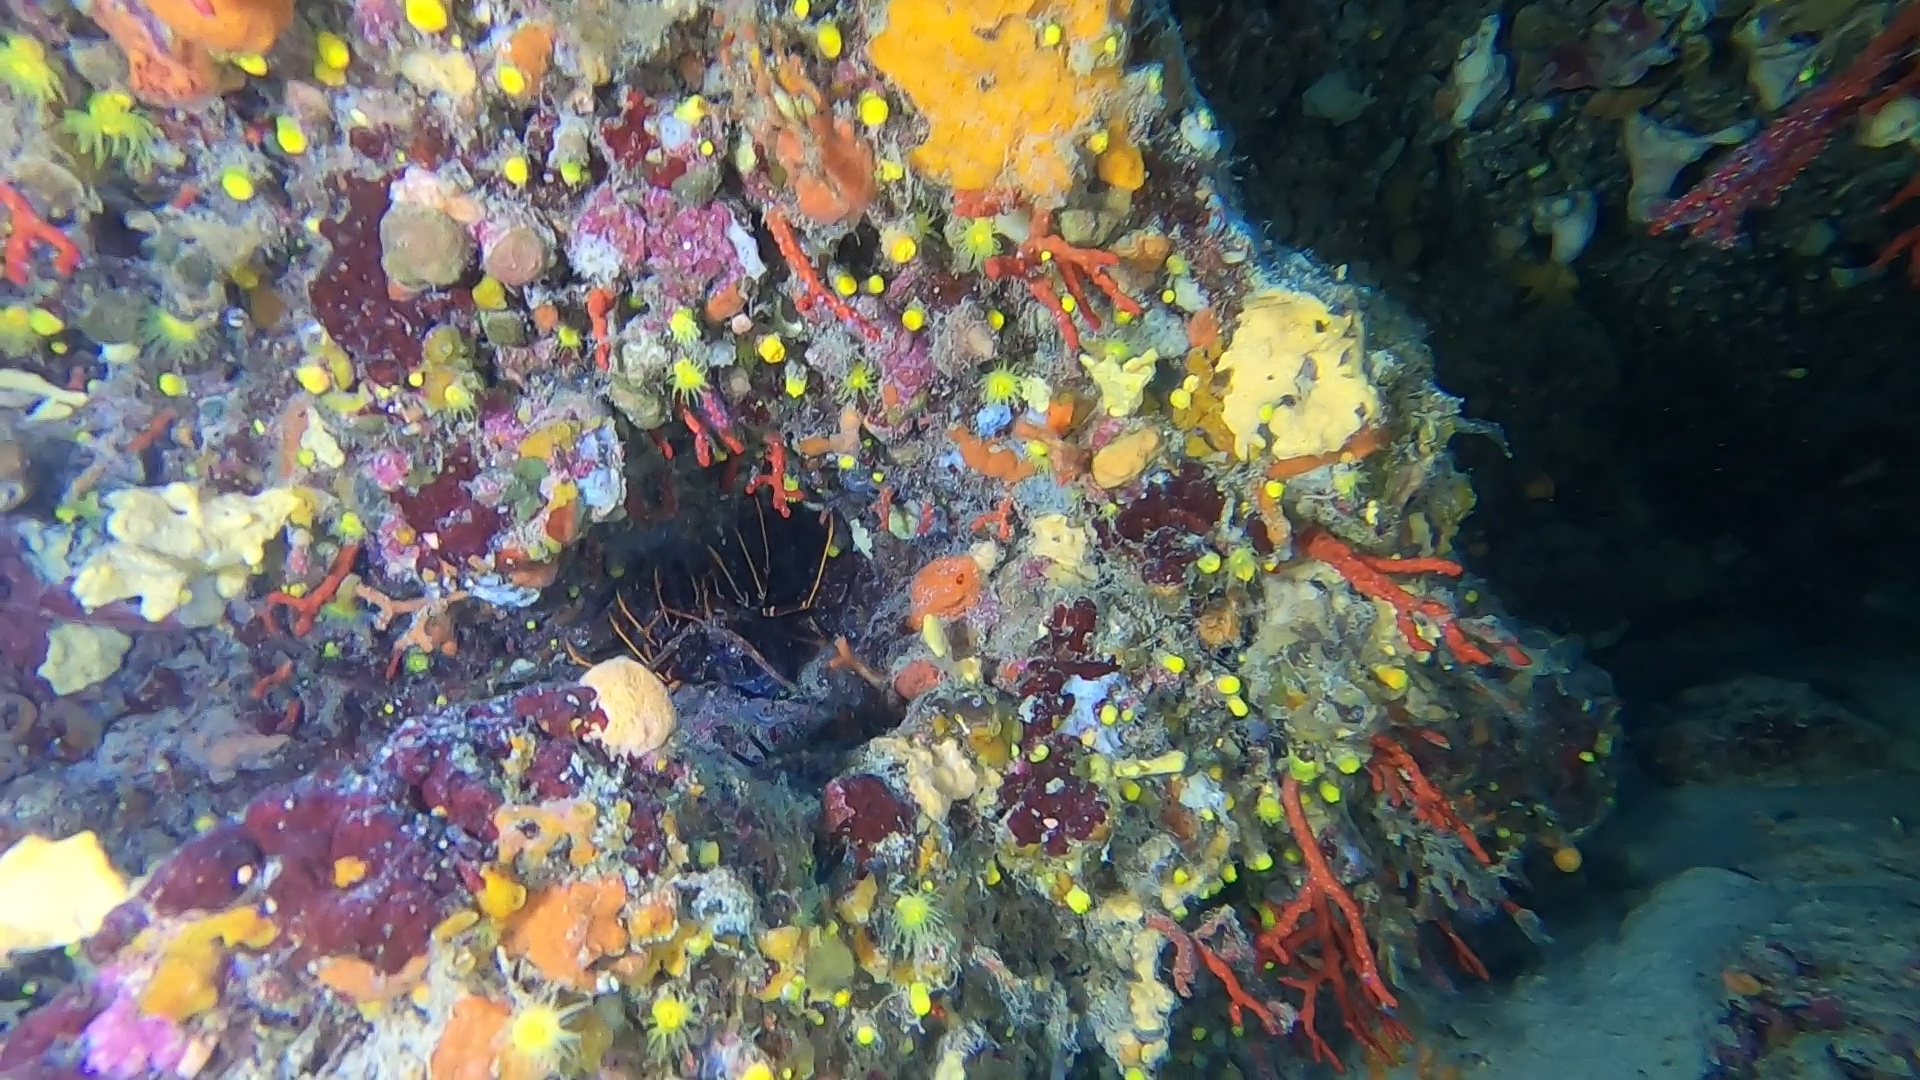 Aragosta Mediterranea Palinurus elephas Spiny lobster - Corallo Rosso - Corallium Rubrum - intotheblue.it